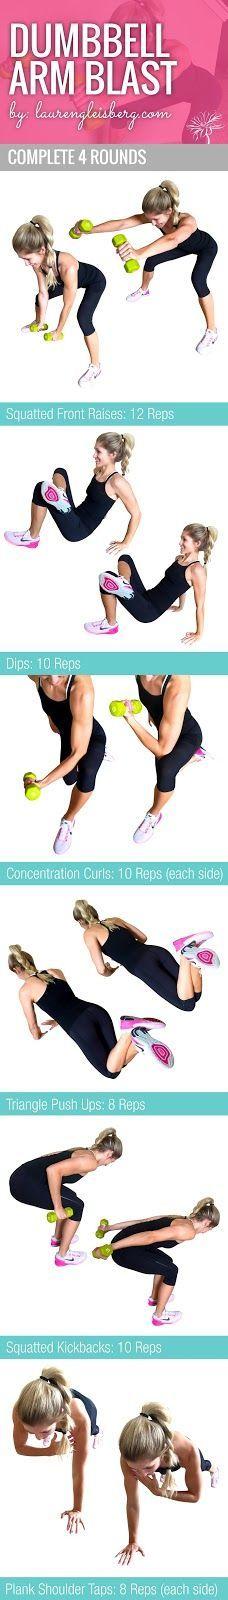 Biceps, Triceps & Shoulders (ConfidenceKini Challenge) - 5/20 | Lauren Gleisberg | Bloglovin'